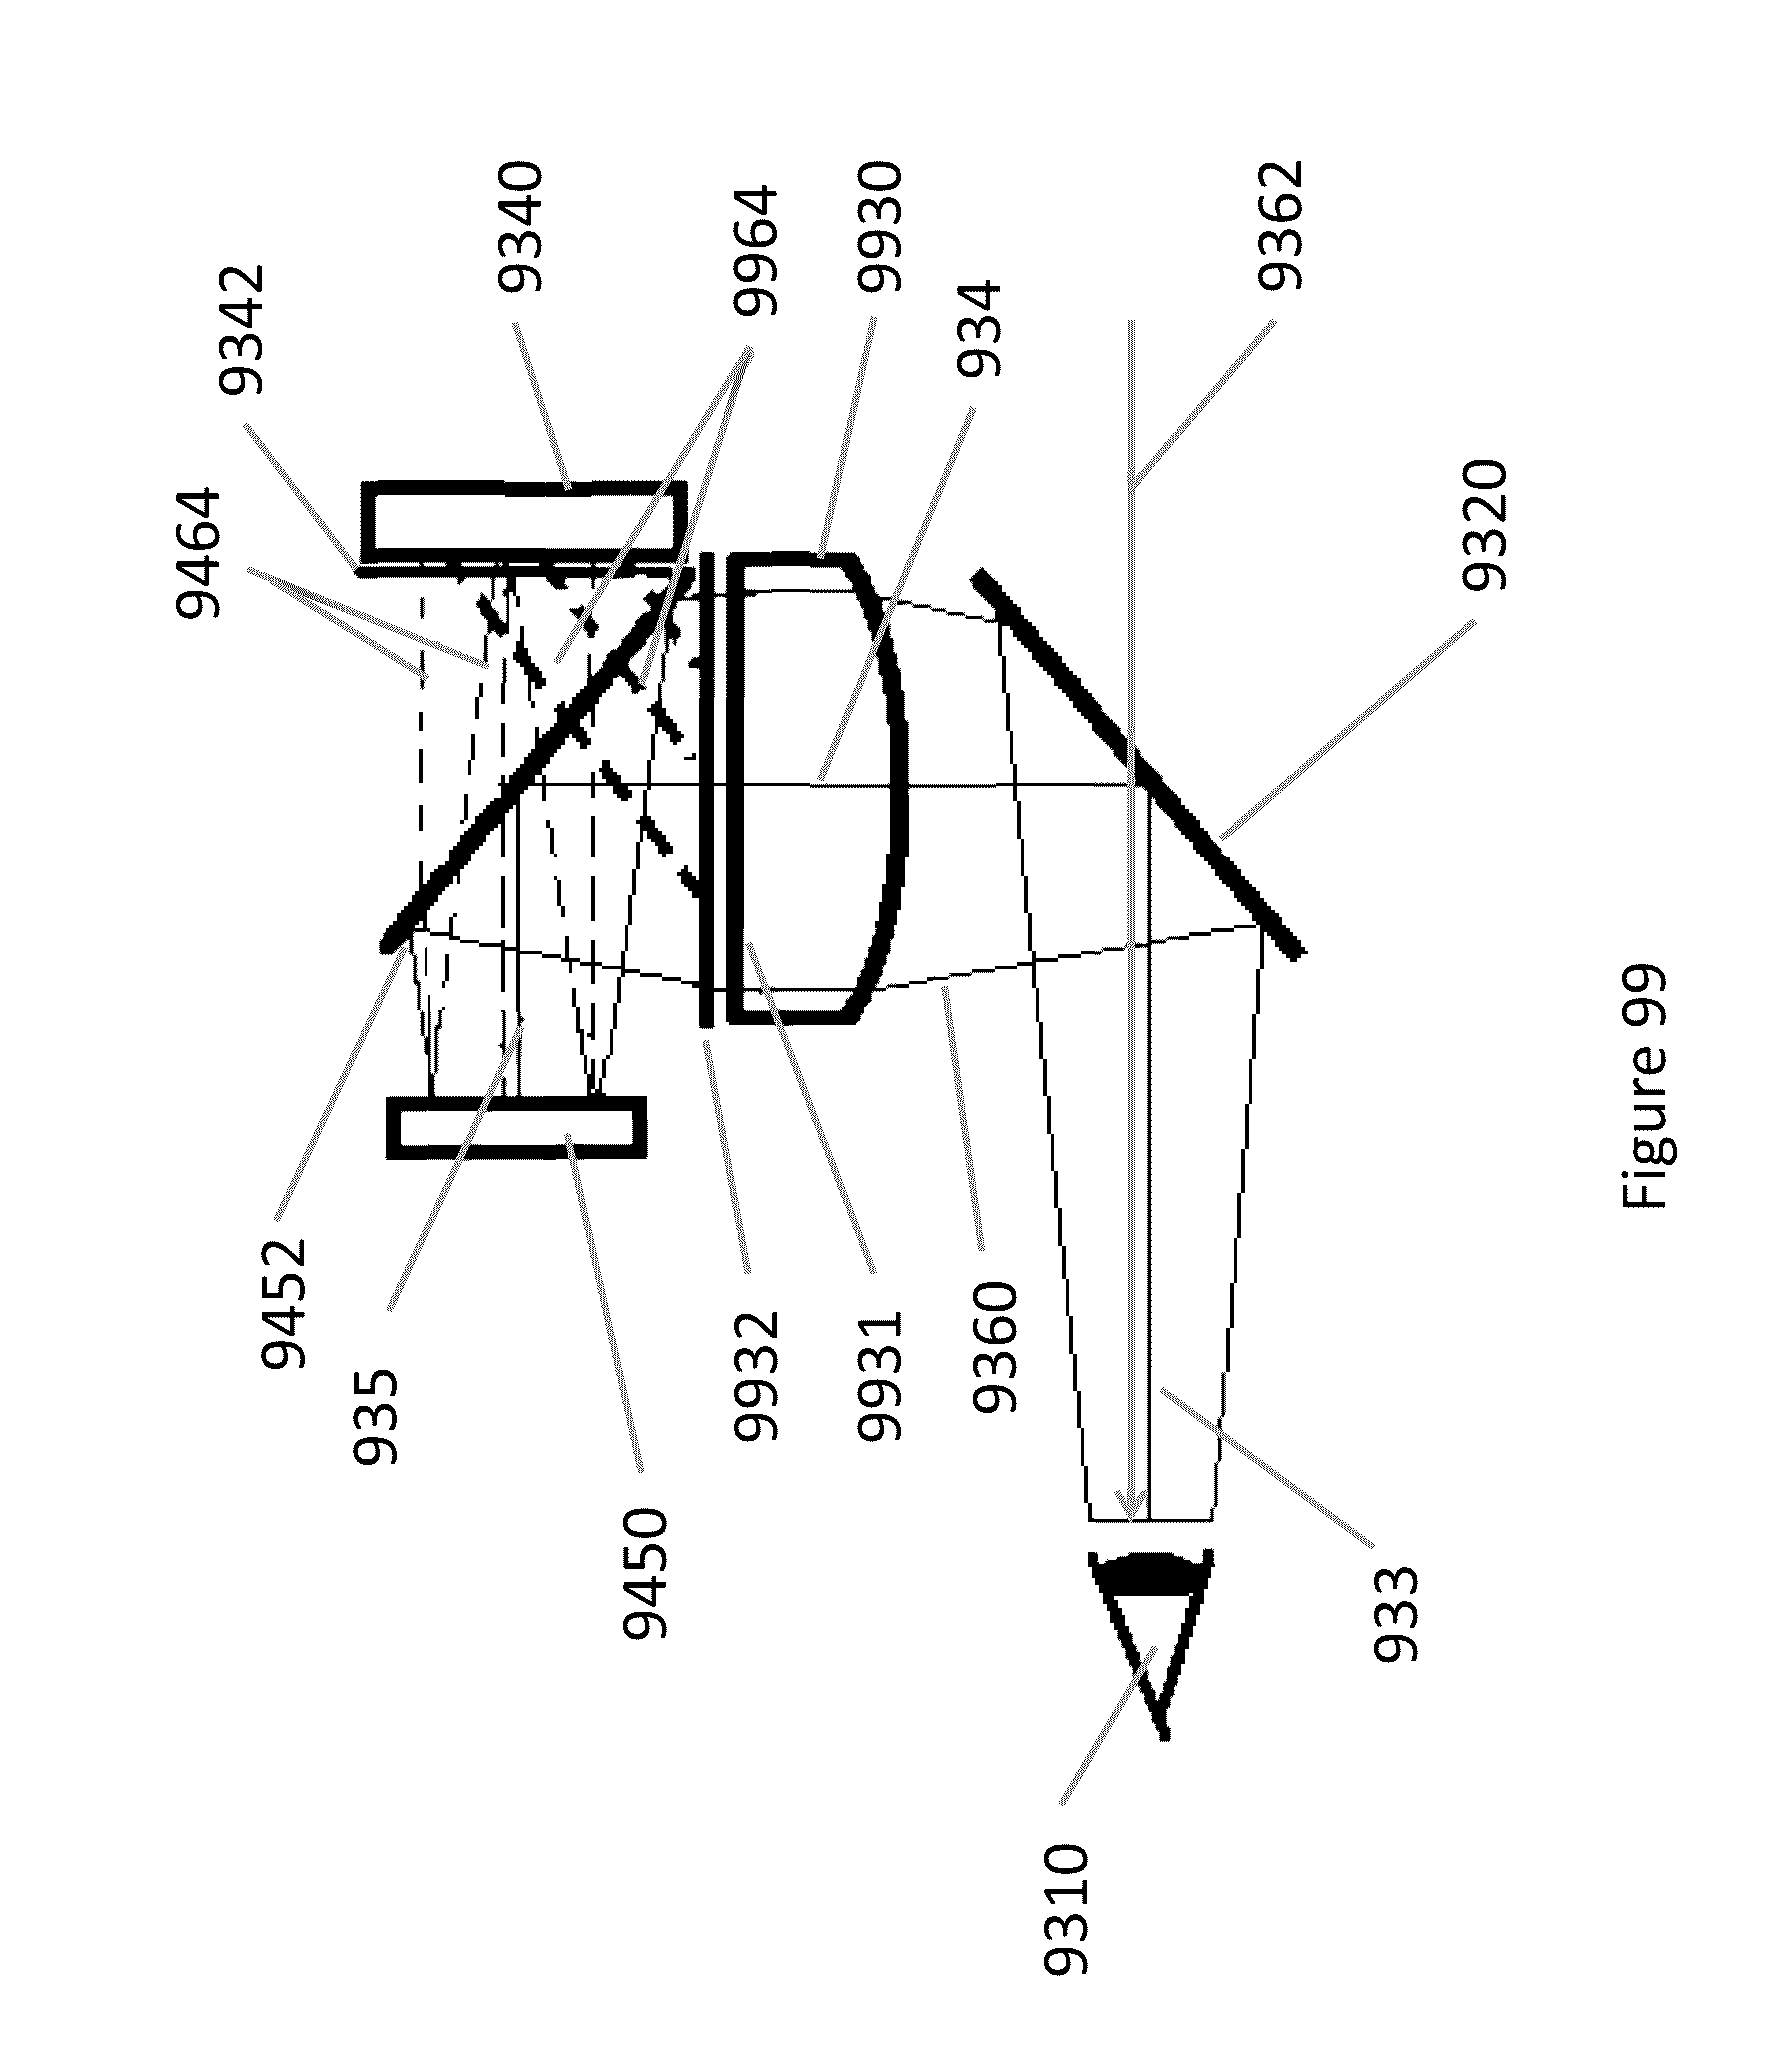 patent us 9 658 457 b2 Big Tex 22GN patent images